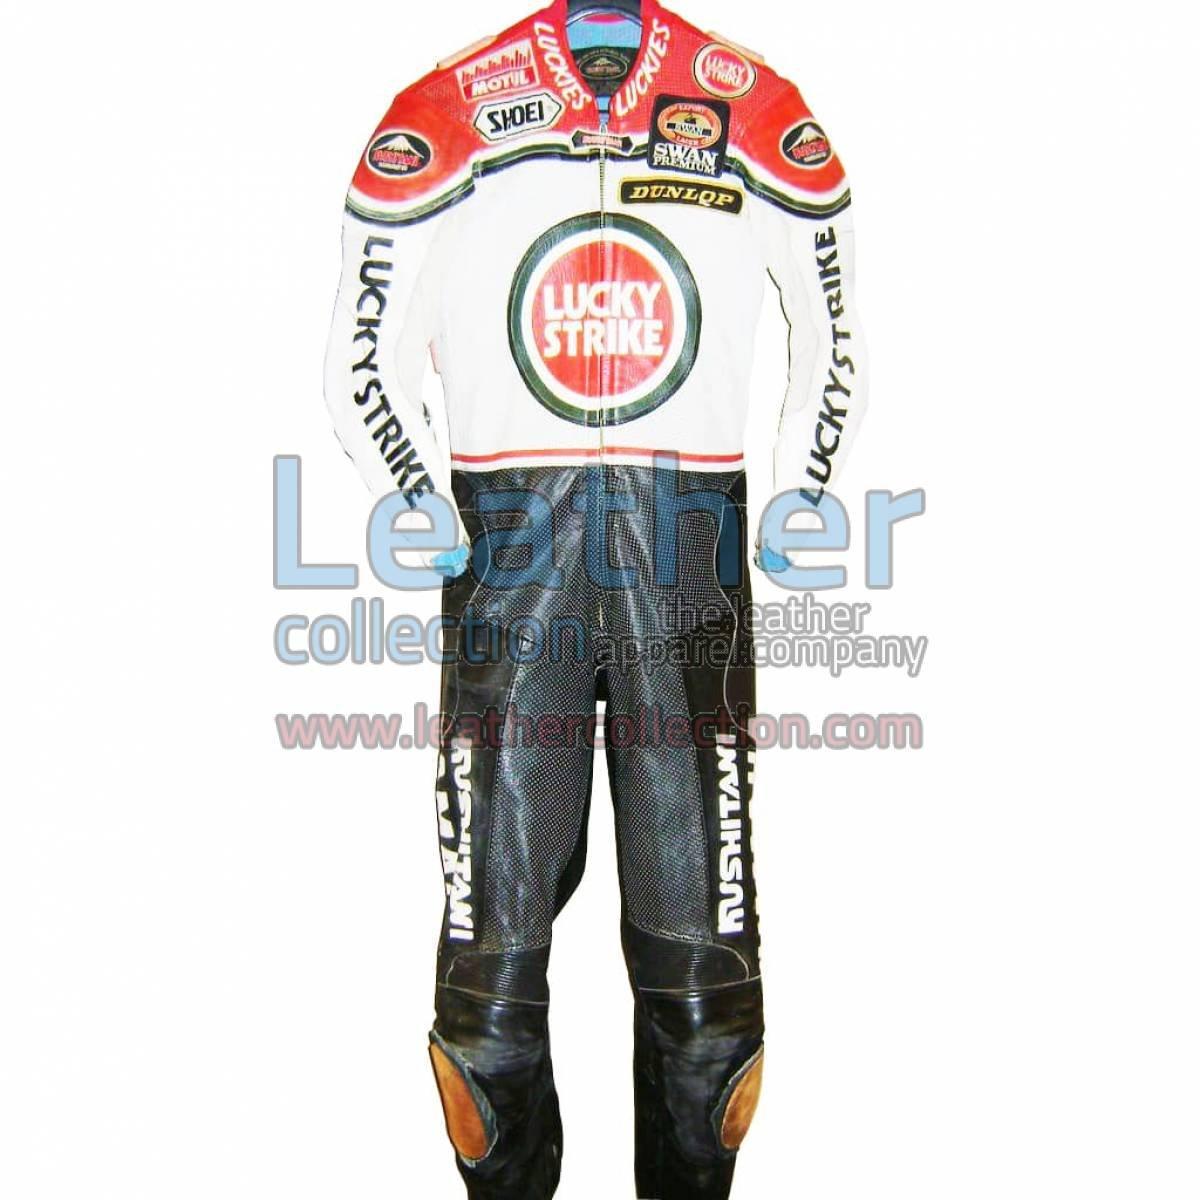 Kevin Magee Yamaha GP 1989 Race Suit